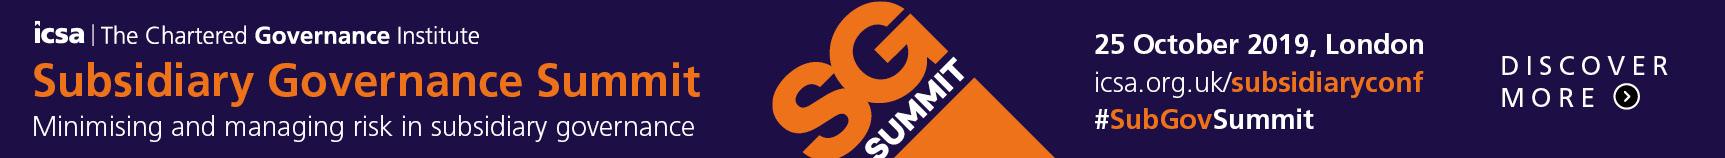 ICSA SG Summit